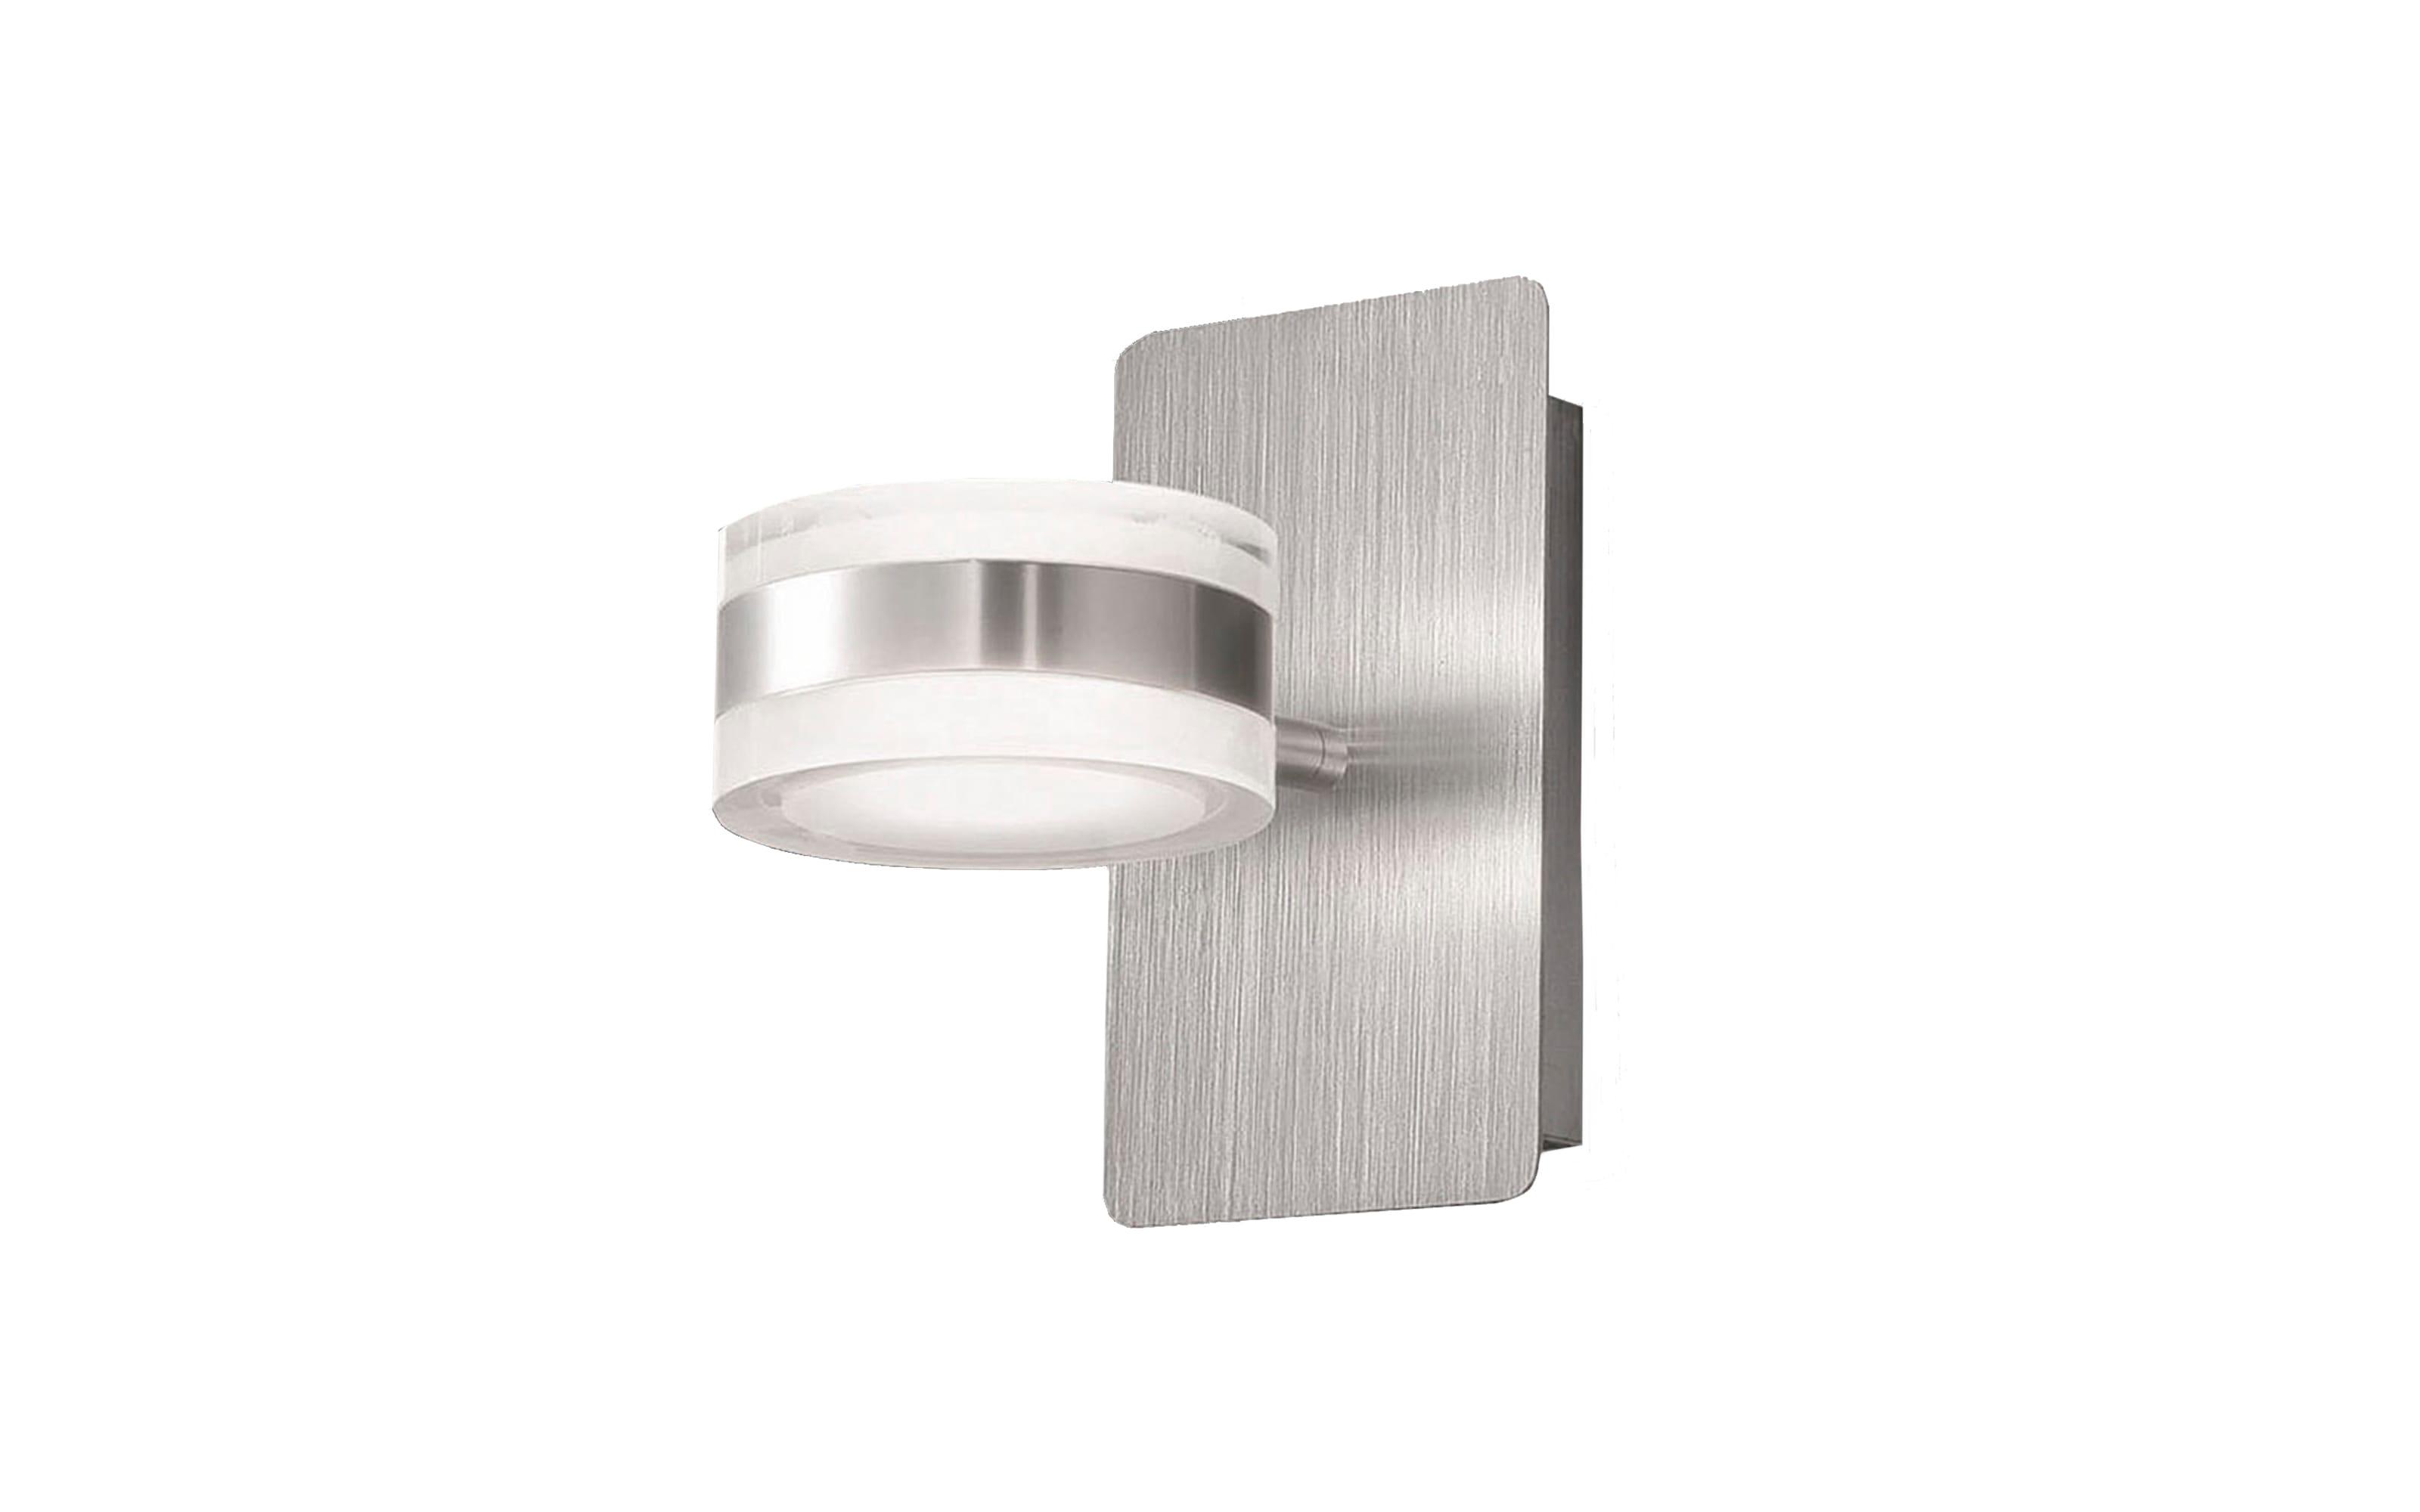 LED-Wandleuchte Dunk aus Aluminium